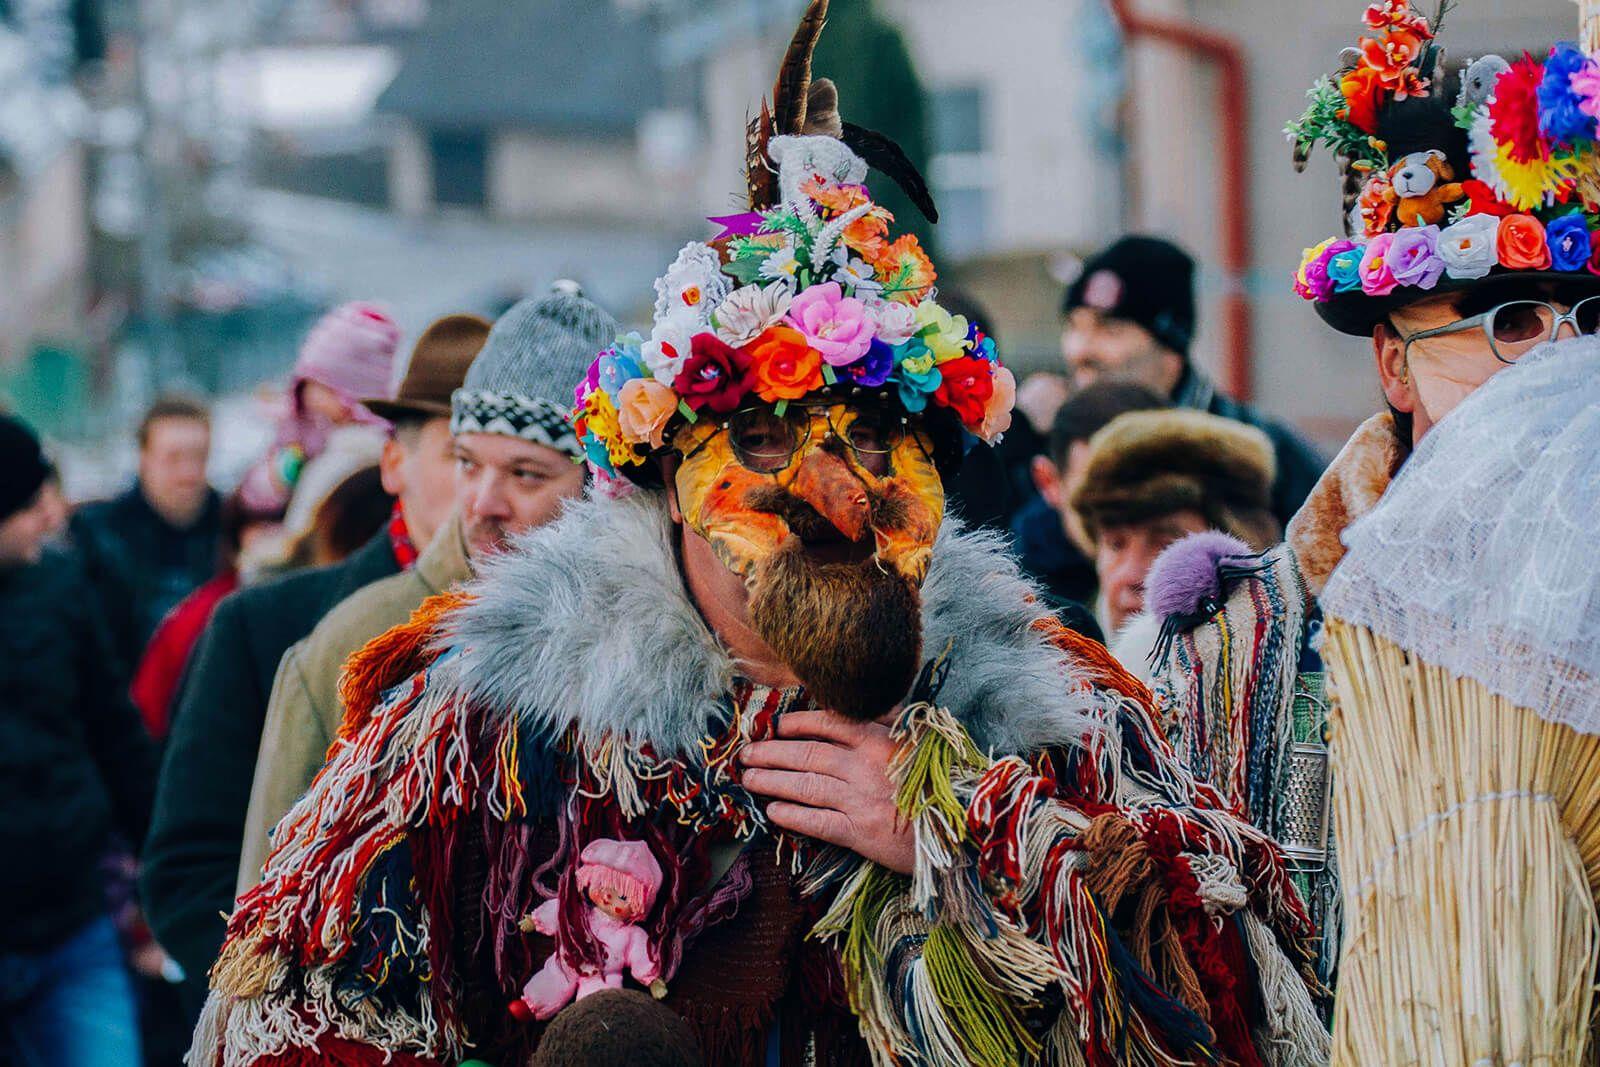 Masopust procession in Vortova. #czechrepublic #carnival #festival #czech#tradition #craft #design #costume #mask #celebrate #culture #travel #world #travelling